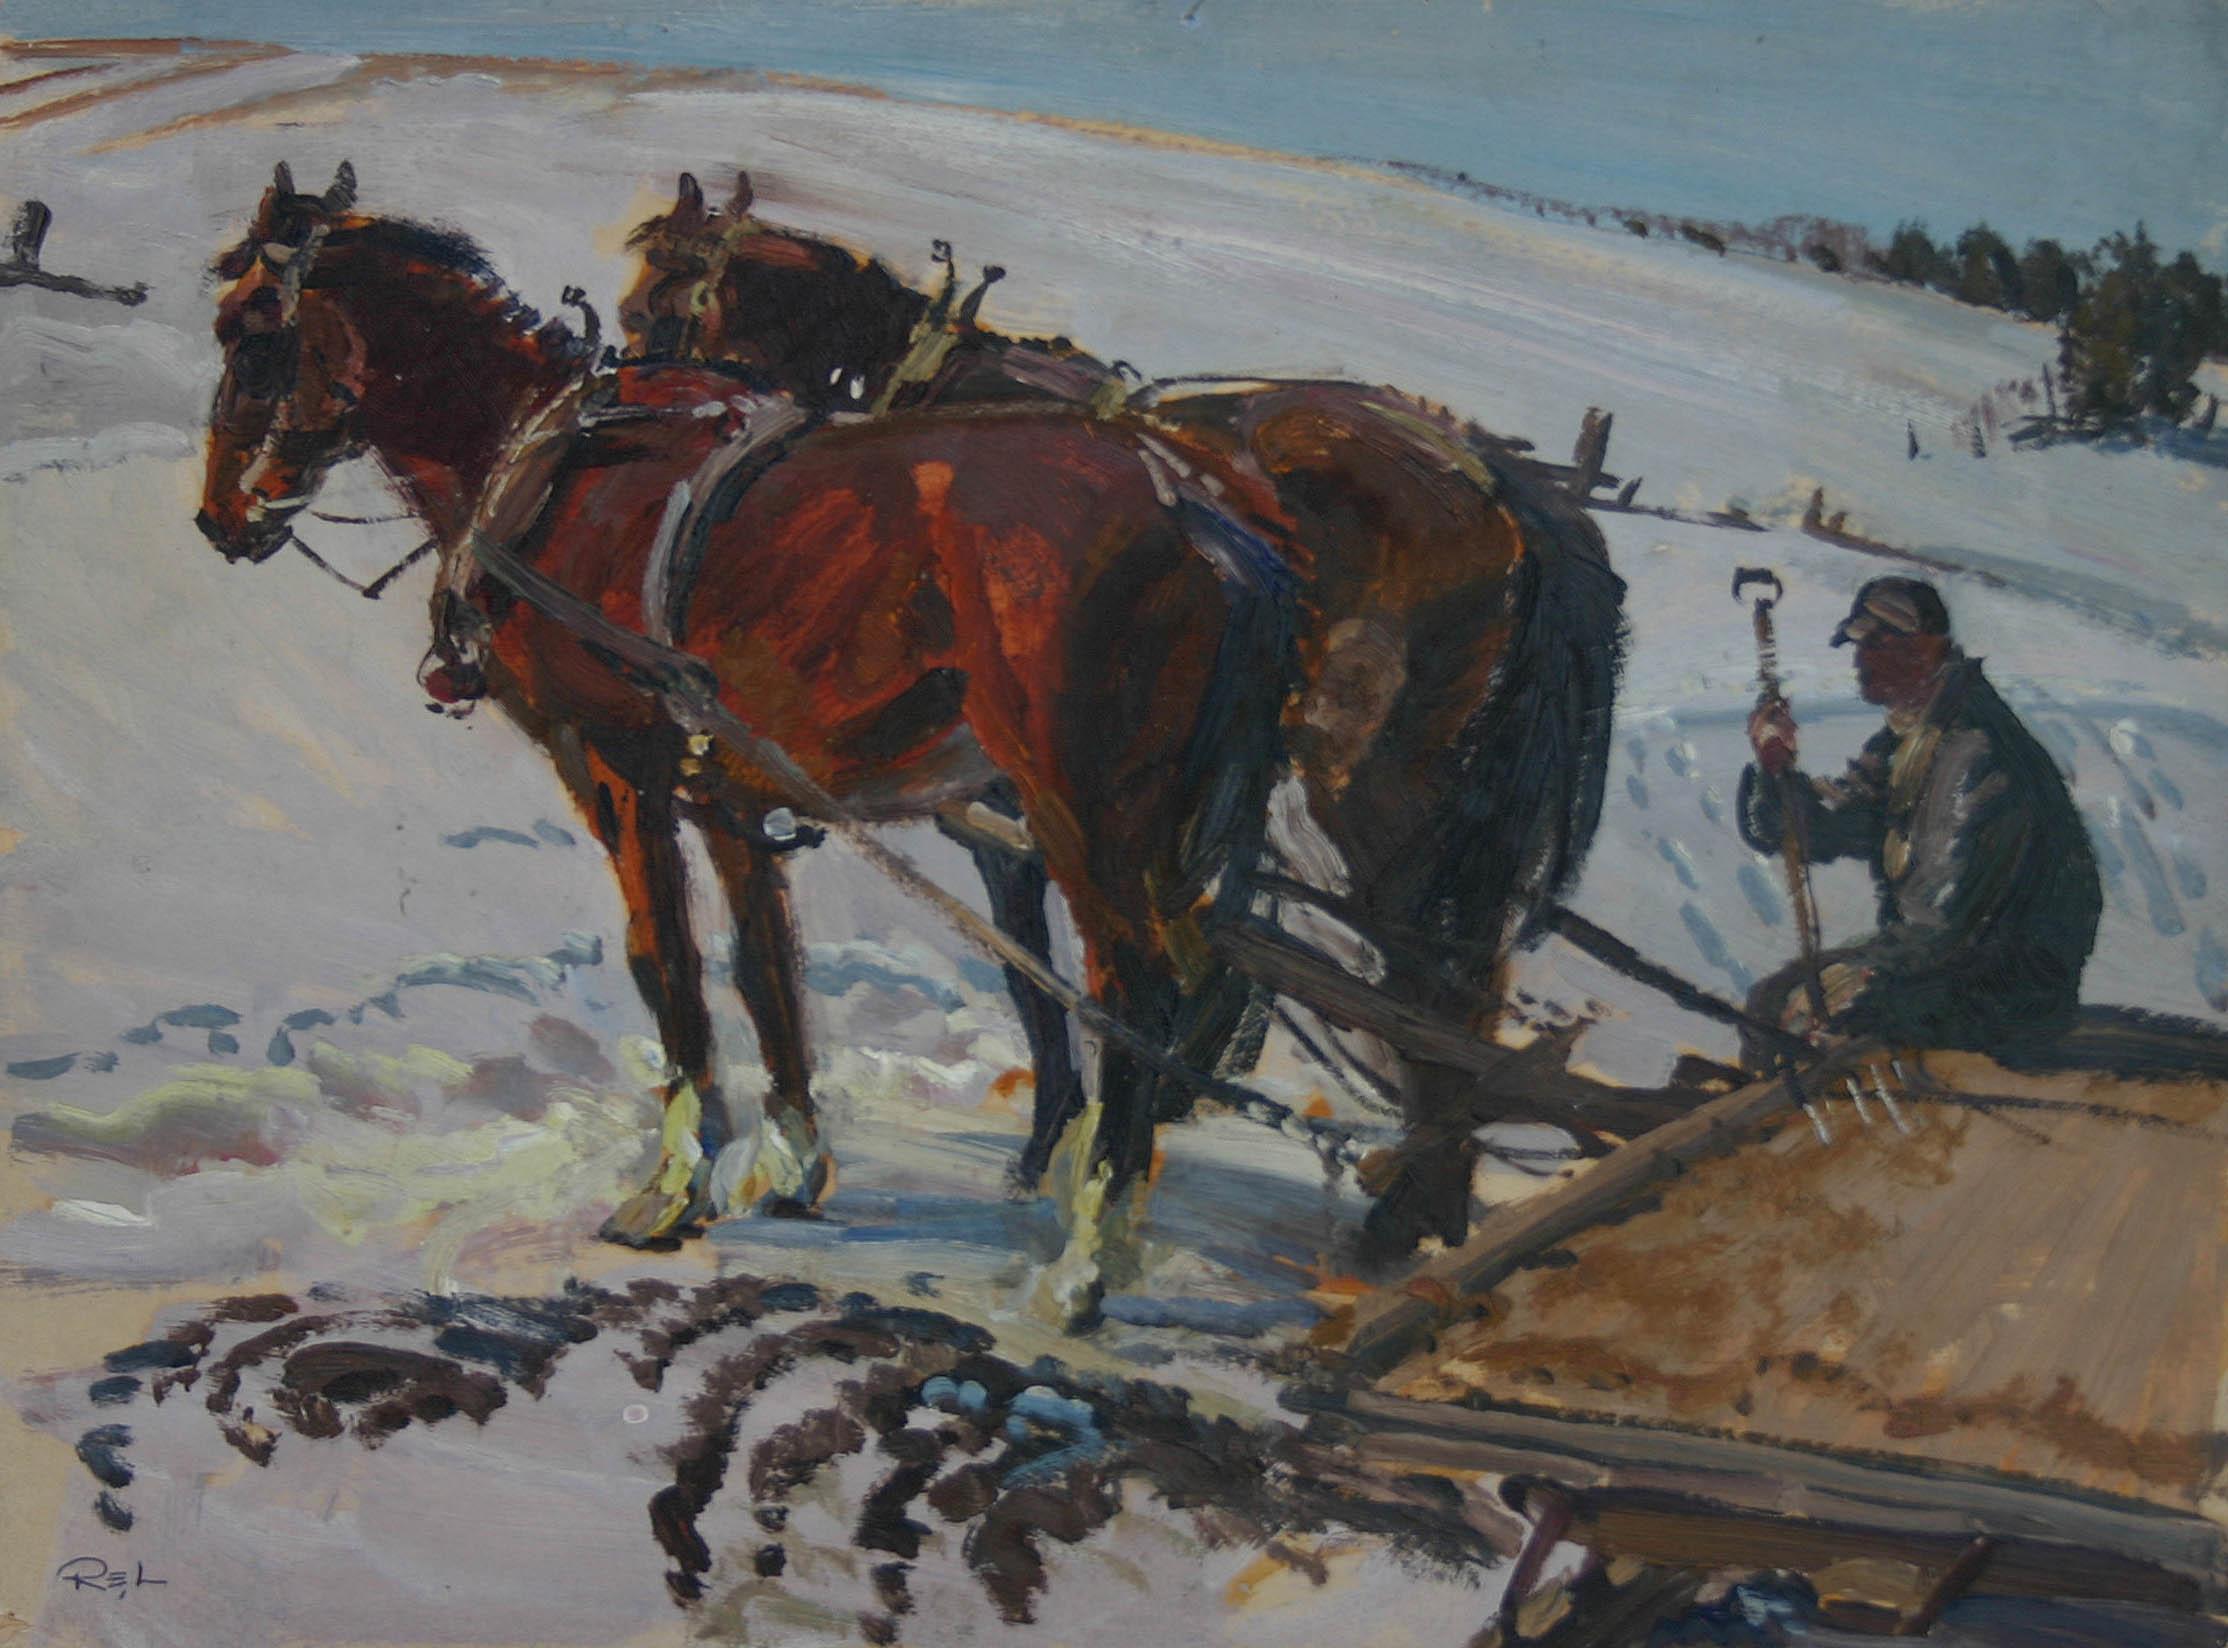 Team & Sleigh by  Robert Lougheed - Masterpiece Online